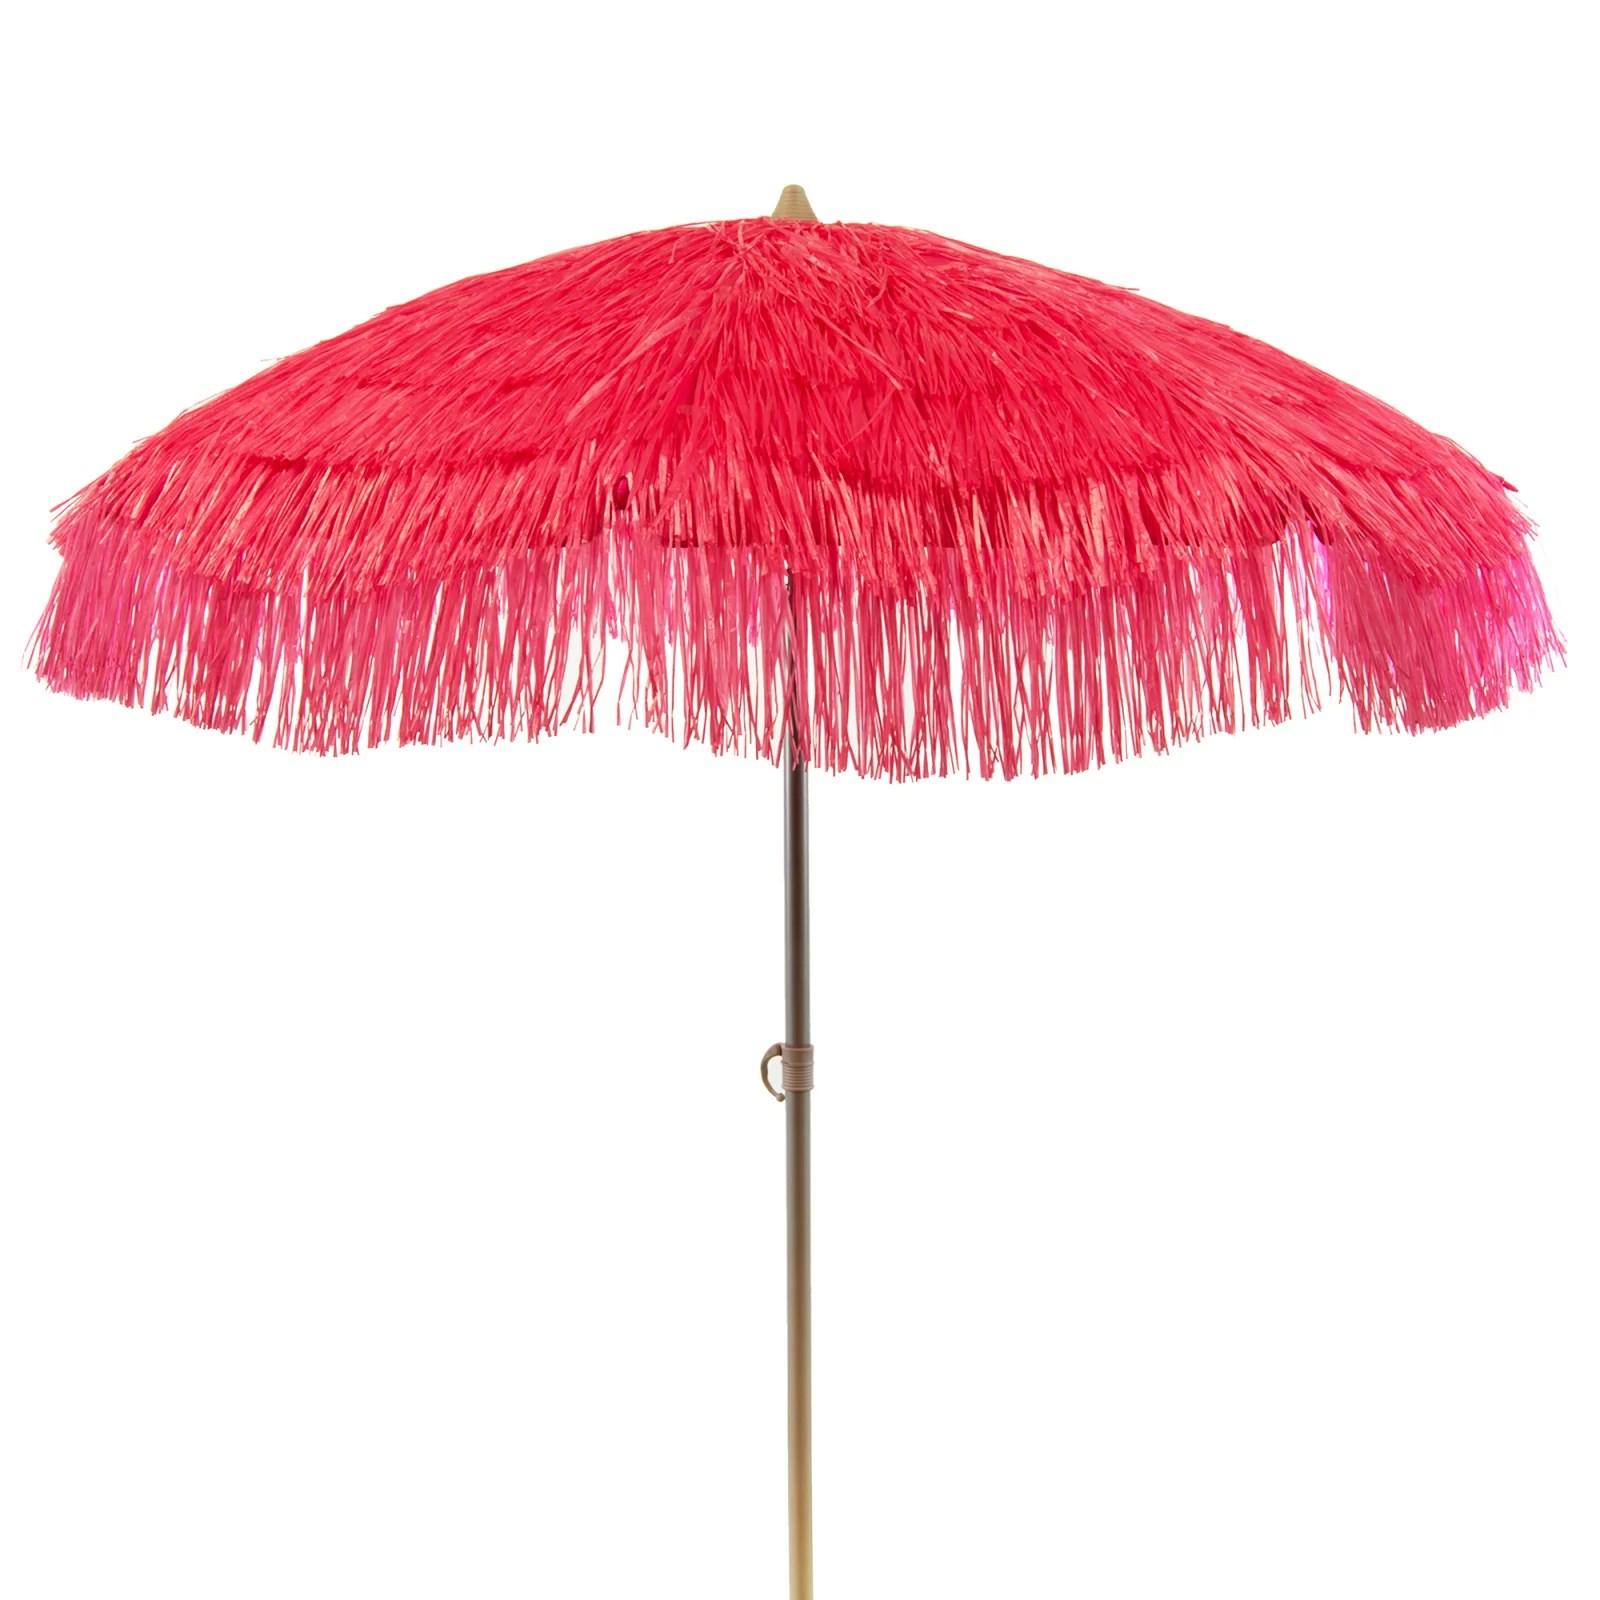 palapa tiki party umbrella patio tilt home canopy sun shield 6ft pink walmart com